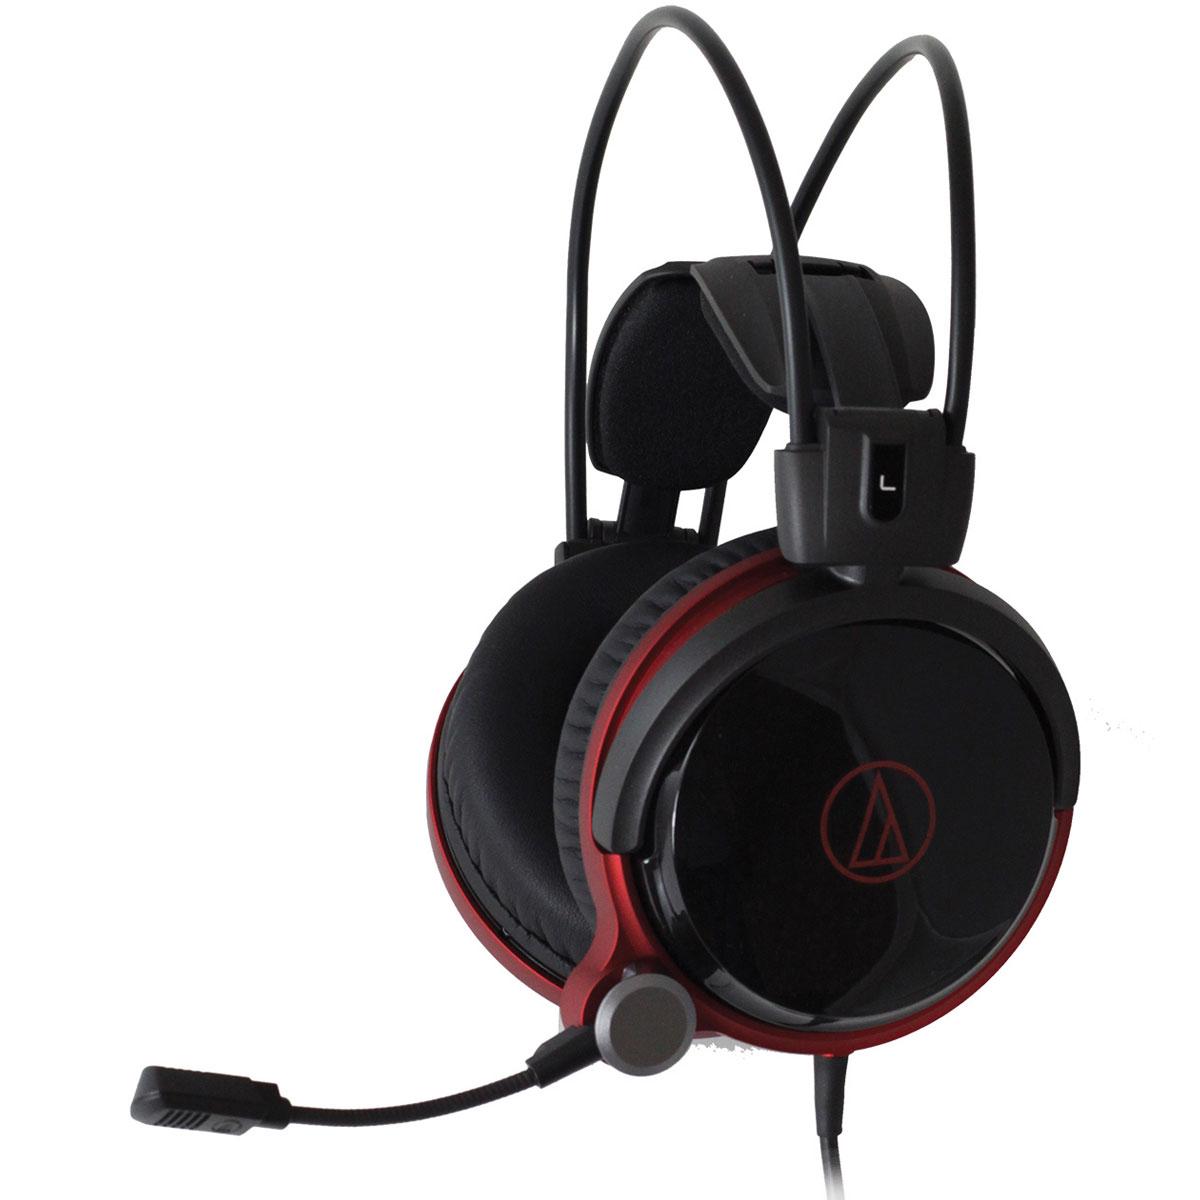 audio technica ath ag1x micro casque audio technica sur. Black Bedroom Furniture Sets. Home Design Ideas